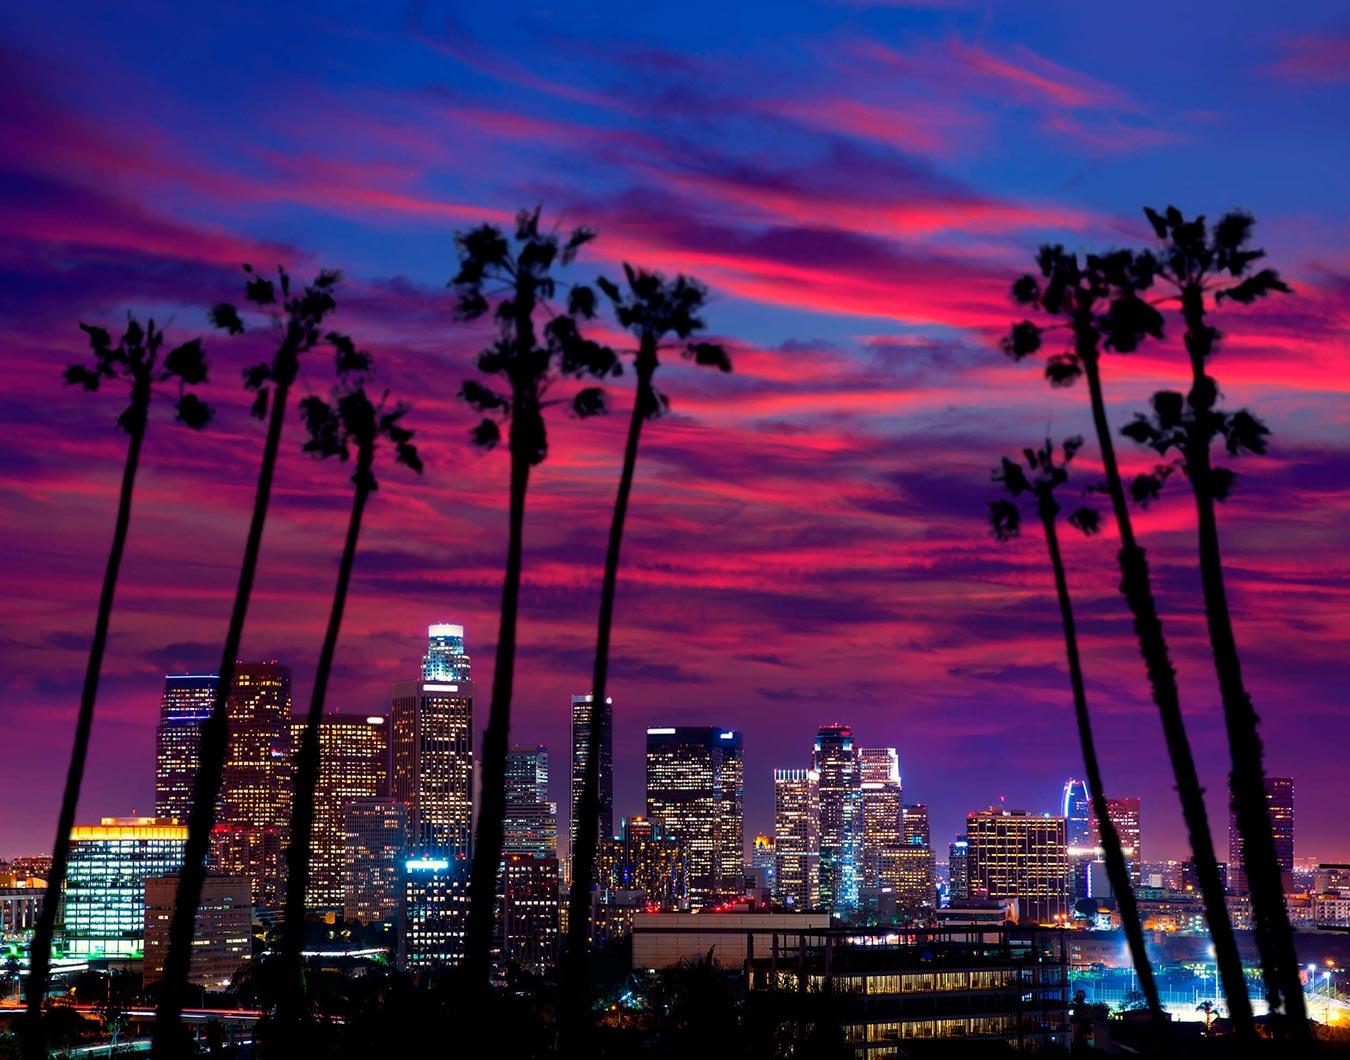 https://secureservercdn.net/50.62.172.232/j4y.c53.myftpupload.com/wp-content/uploads/2018/12/Los-Angeles.jpg?time=1585884550